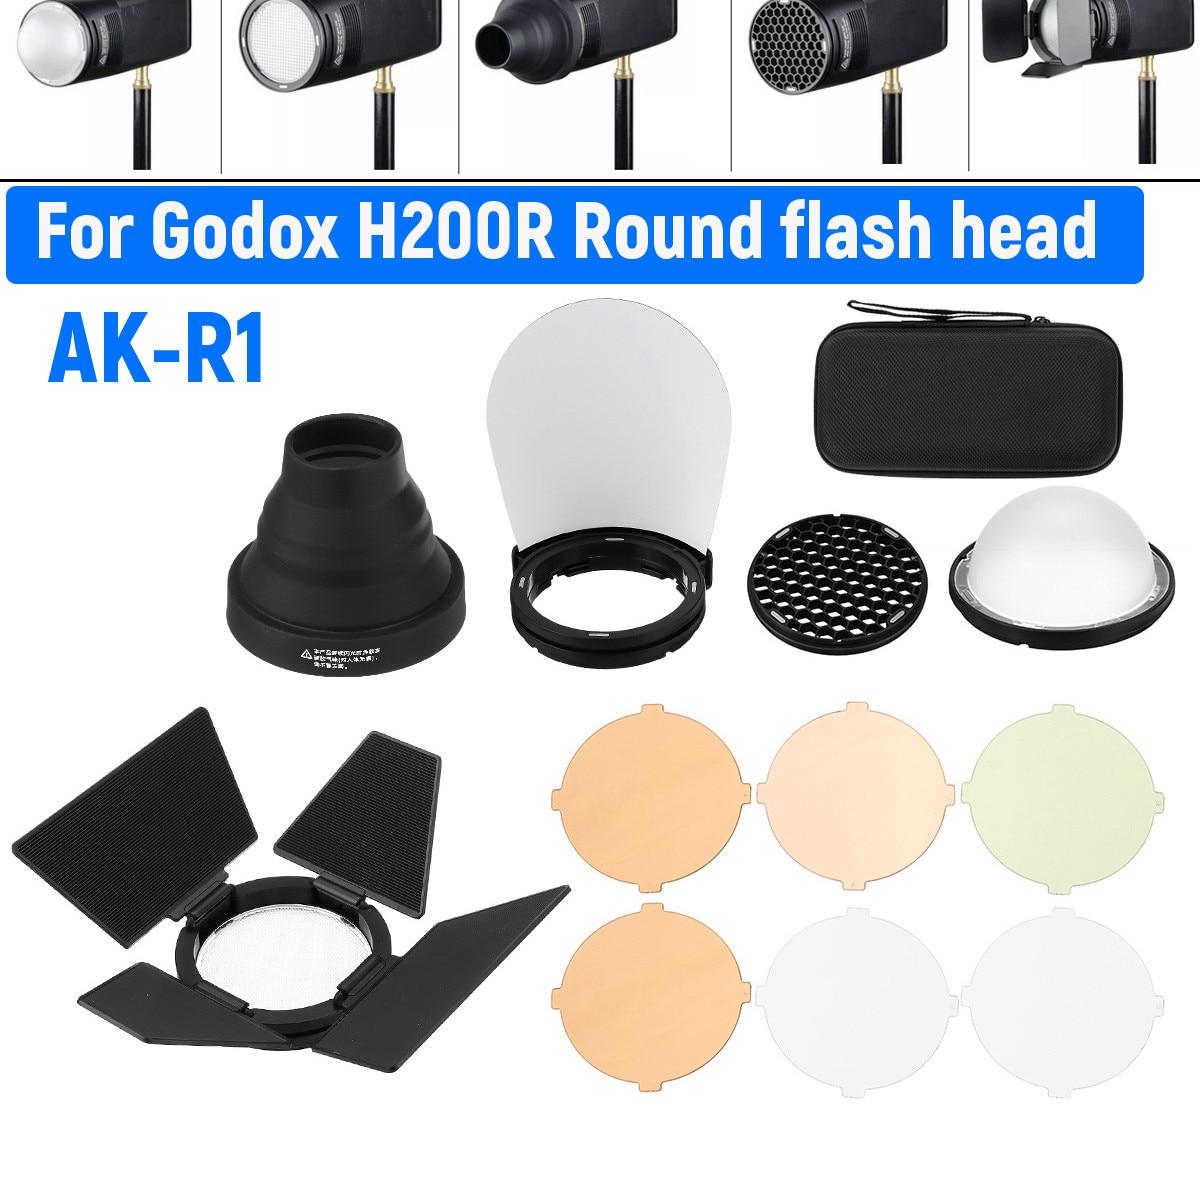 AK-R1 Barn Door Snoot Color Filter Kits Reflector Honeycomb Diffuser Ball Kits For Godox H200R Round Flash Head